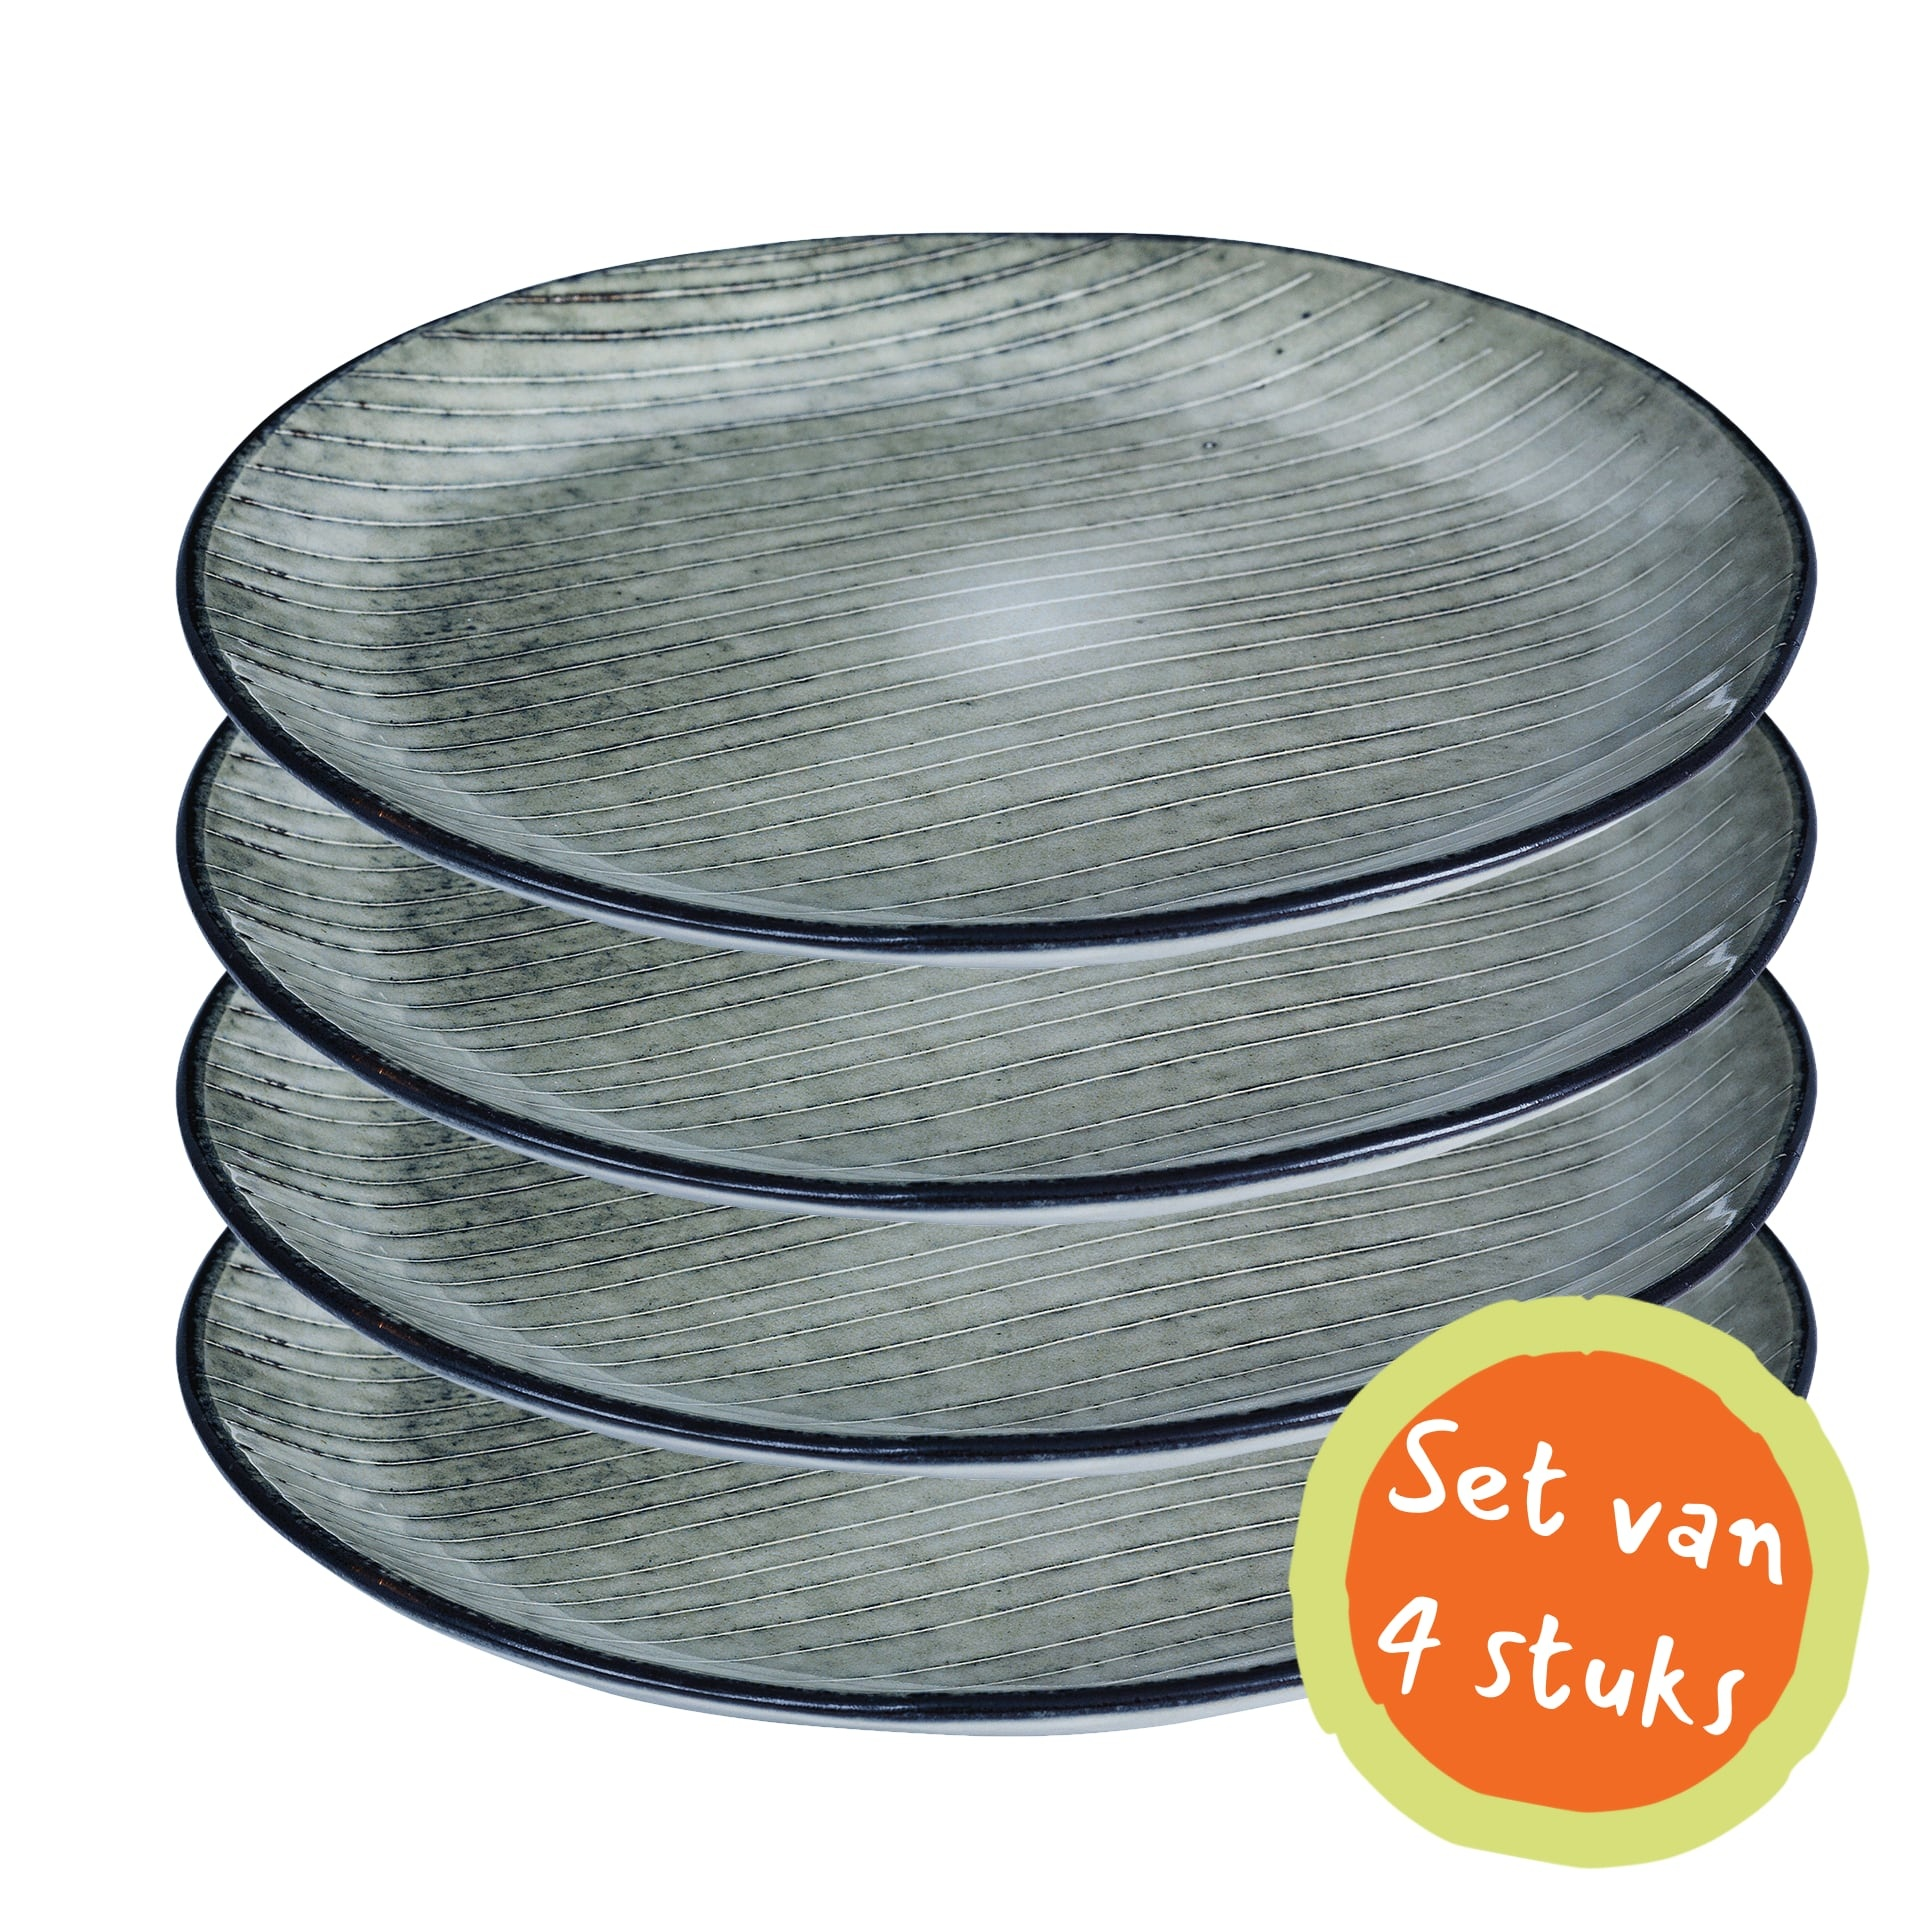 Broste Copenhagen Ontbijtbord/lunchbord Nordic Sea - ø20cm - set van 4-14441074-5709895363799